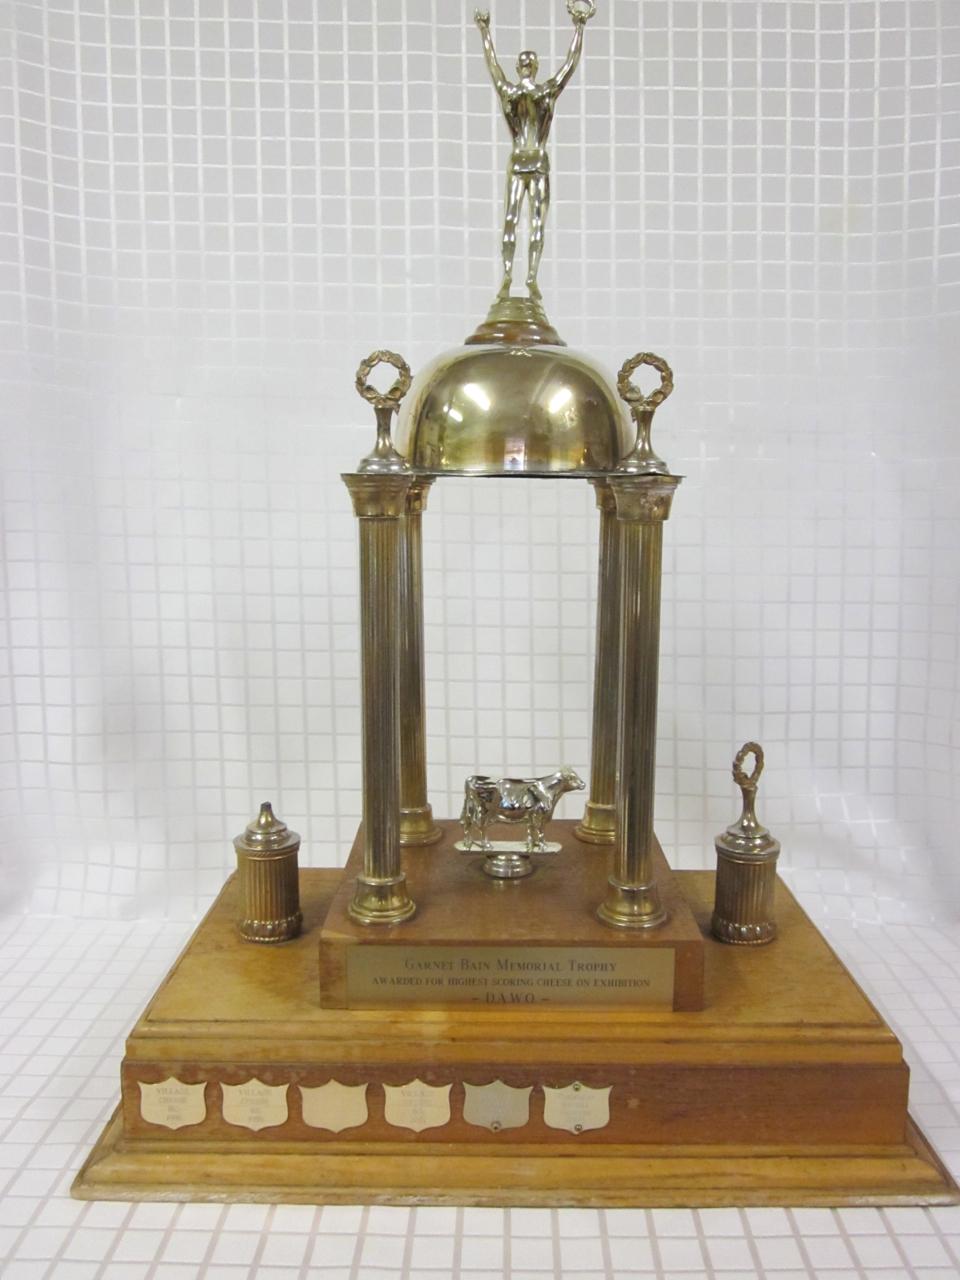 Garnet Bain Memorial Trophy